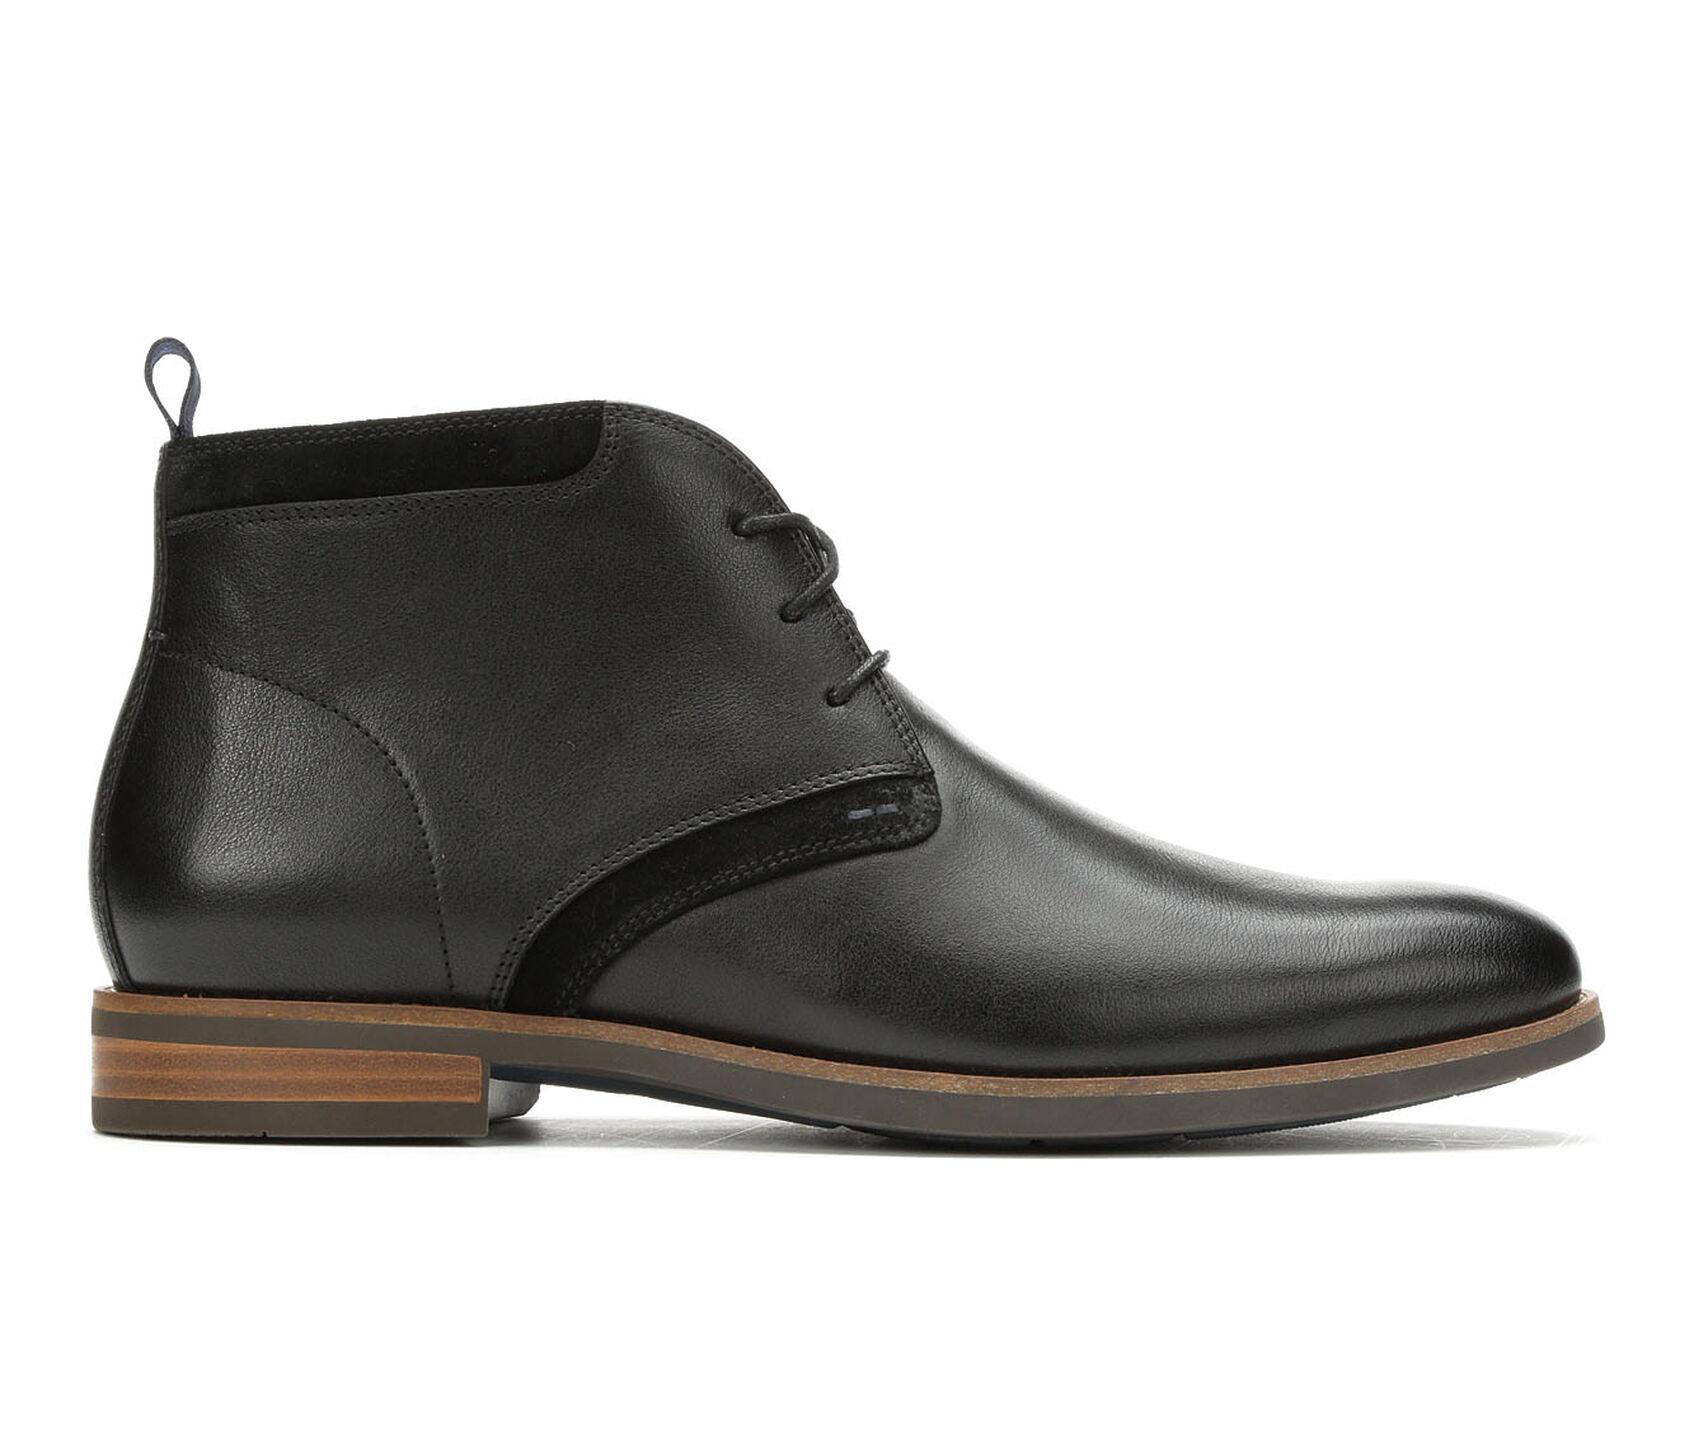 73951dcc3047b Men's Florsheim Uptown Chukka Boot Dress Shoes | Shoe Carnival